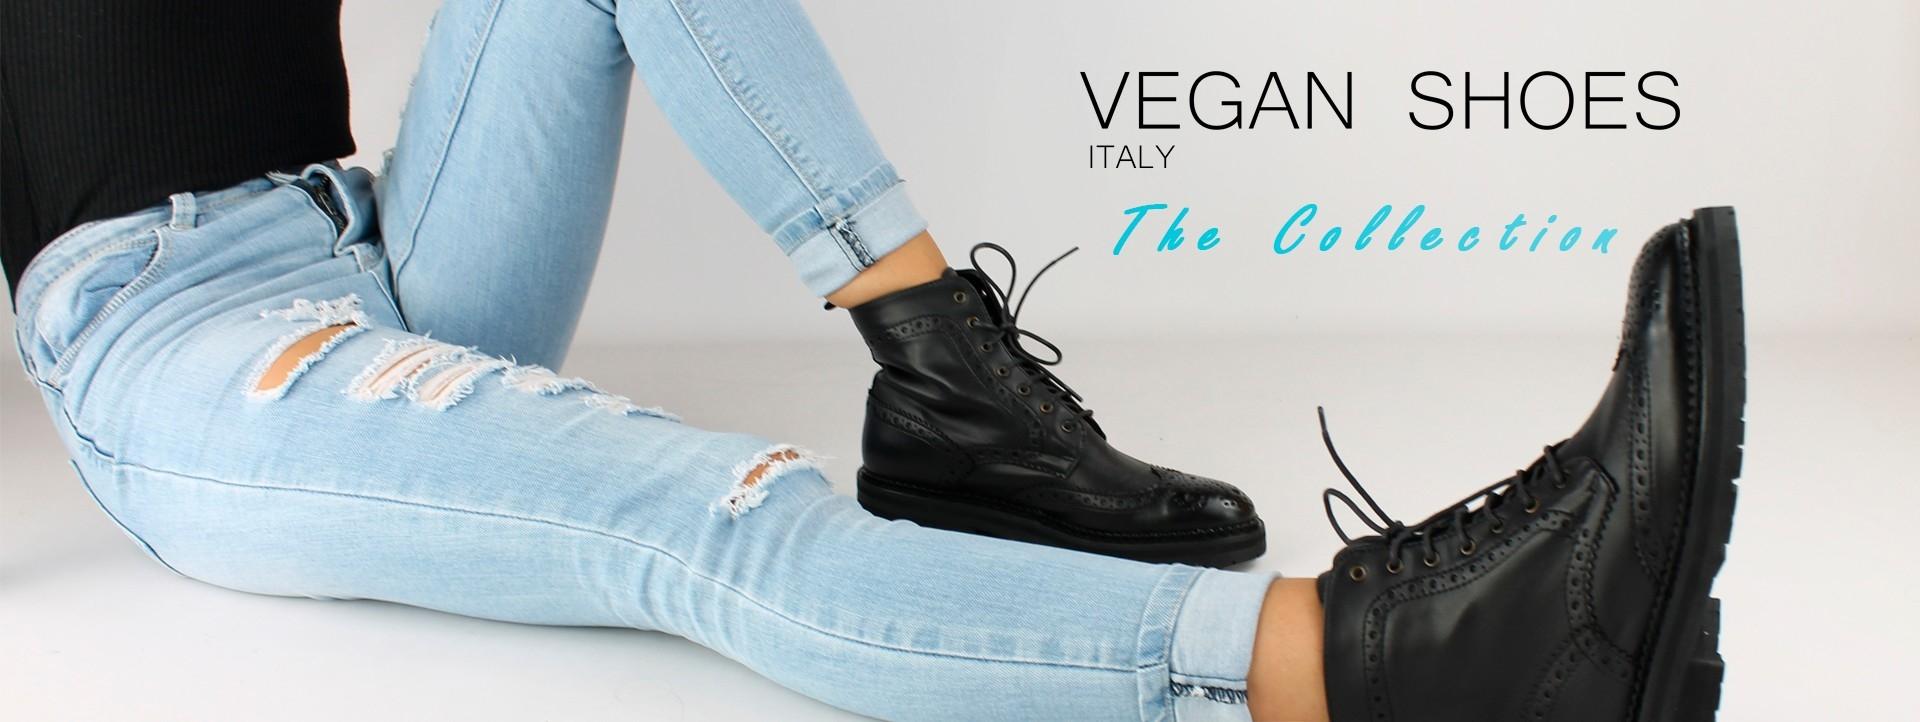 VeganShoes.it